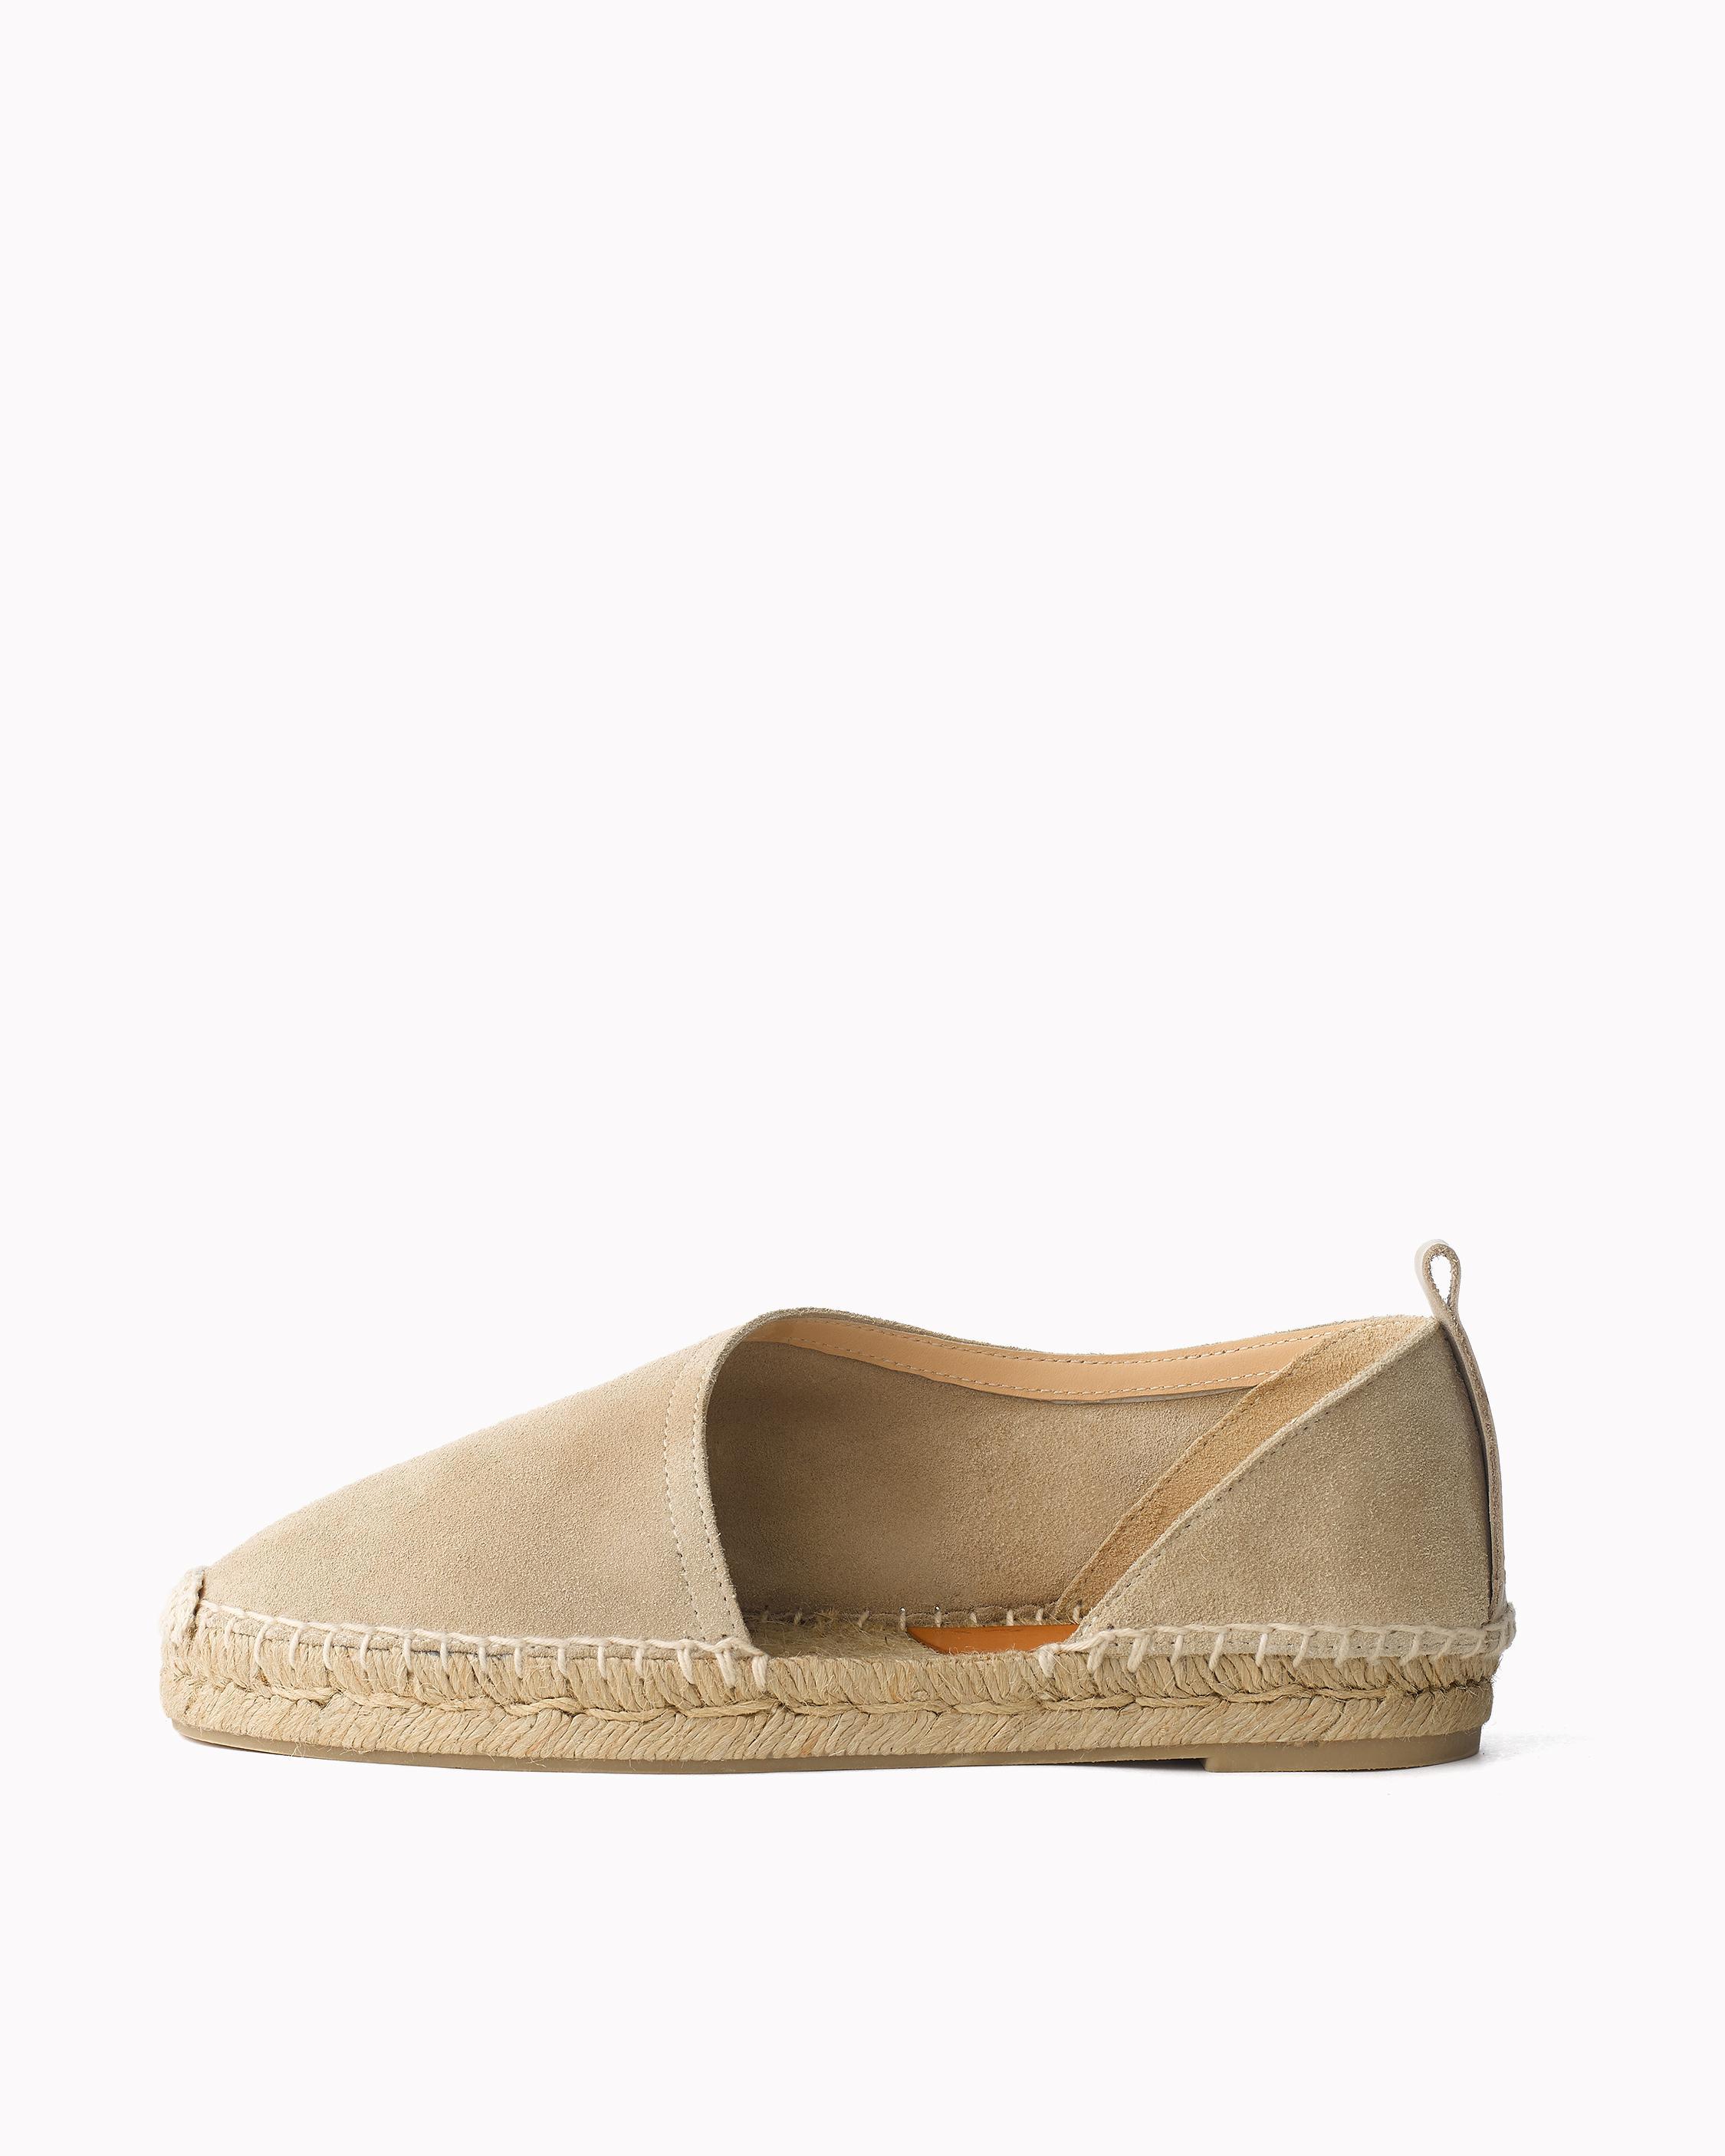 Rag & Bone Woman Suede Platform Espadrille Sandals Sand Size 41 Rag & Bone nWtUD54